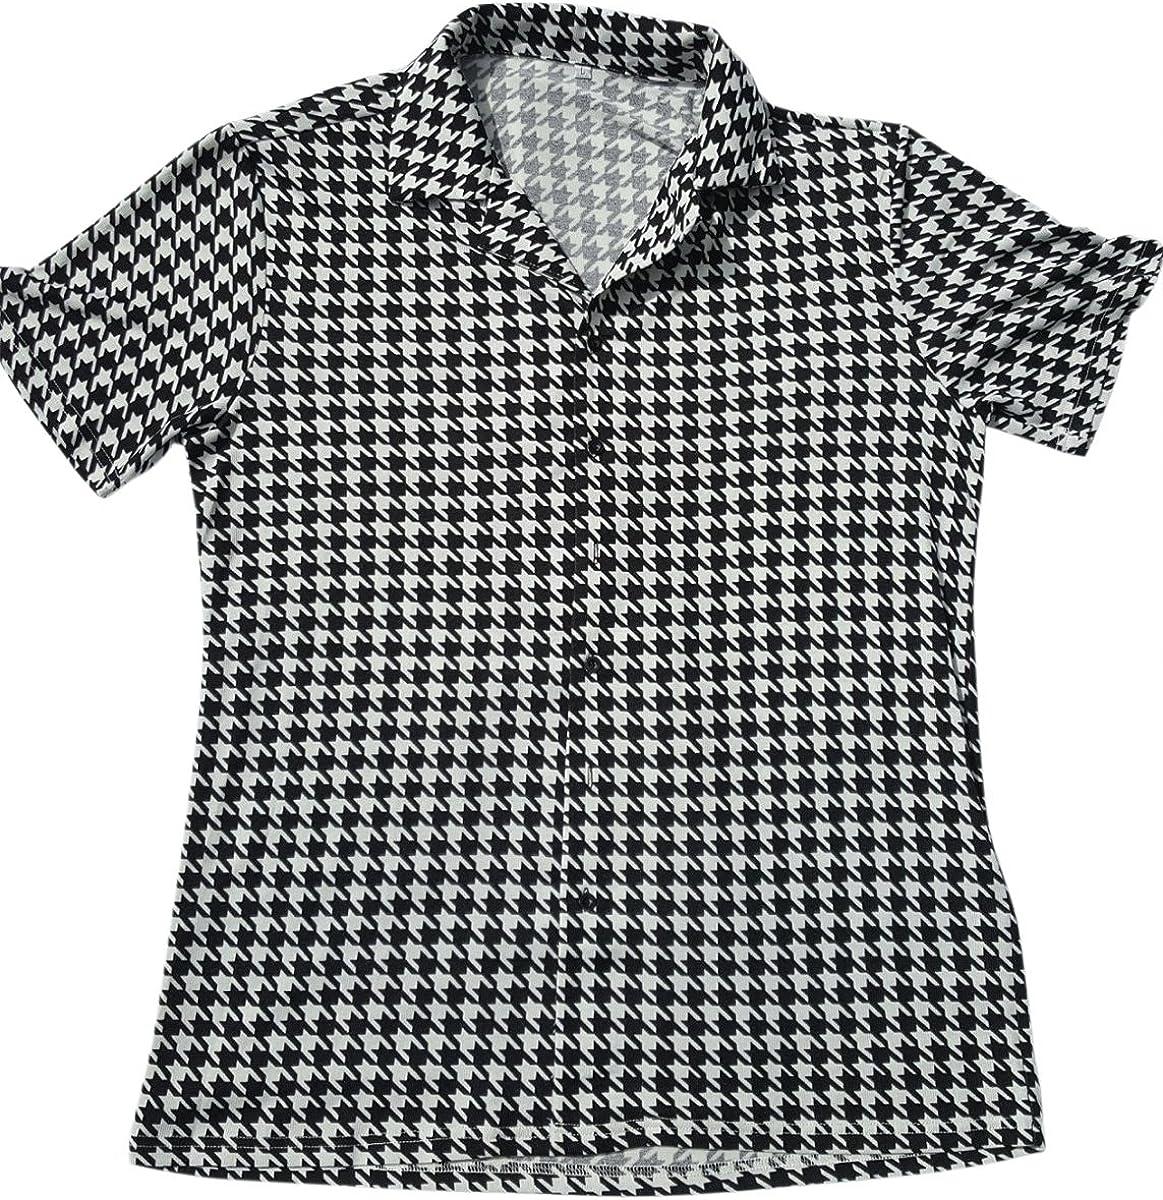 The Hank Shop Men's Houndstooth Shirt Bowling Shirt